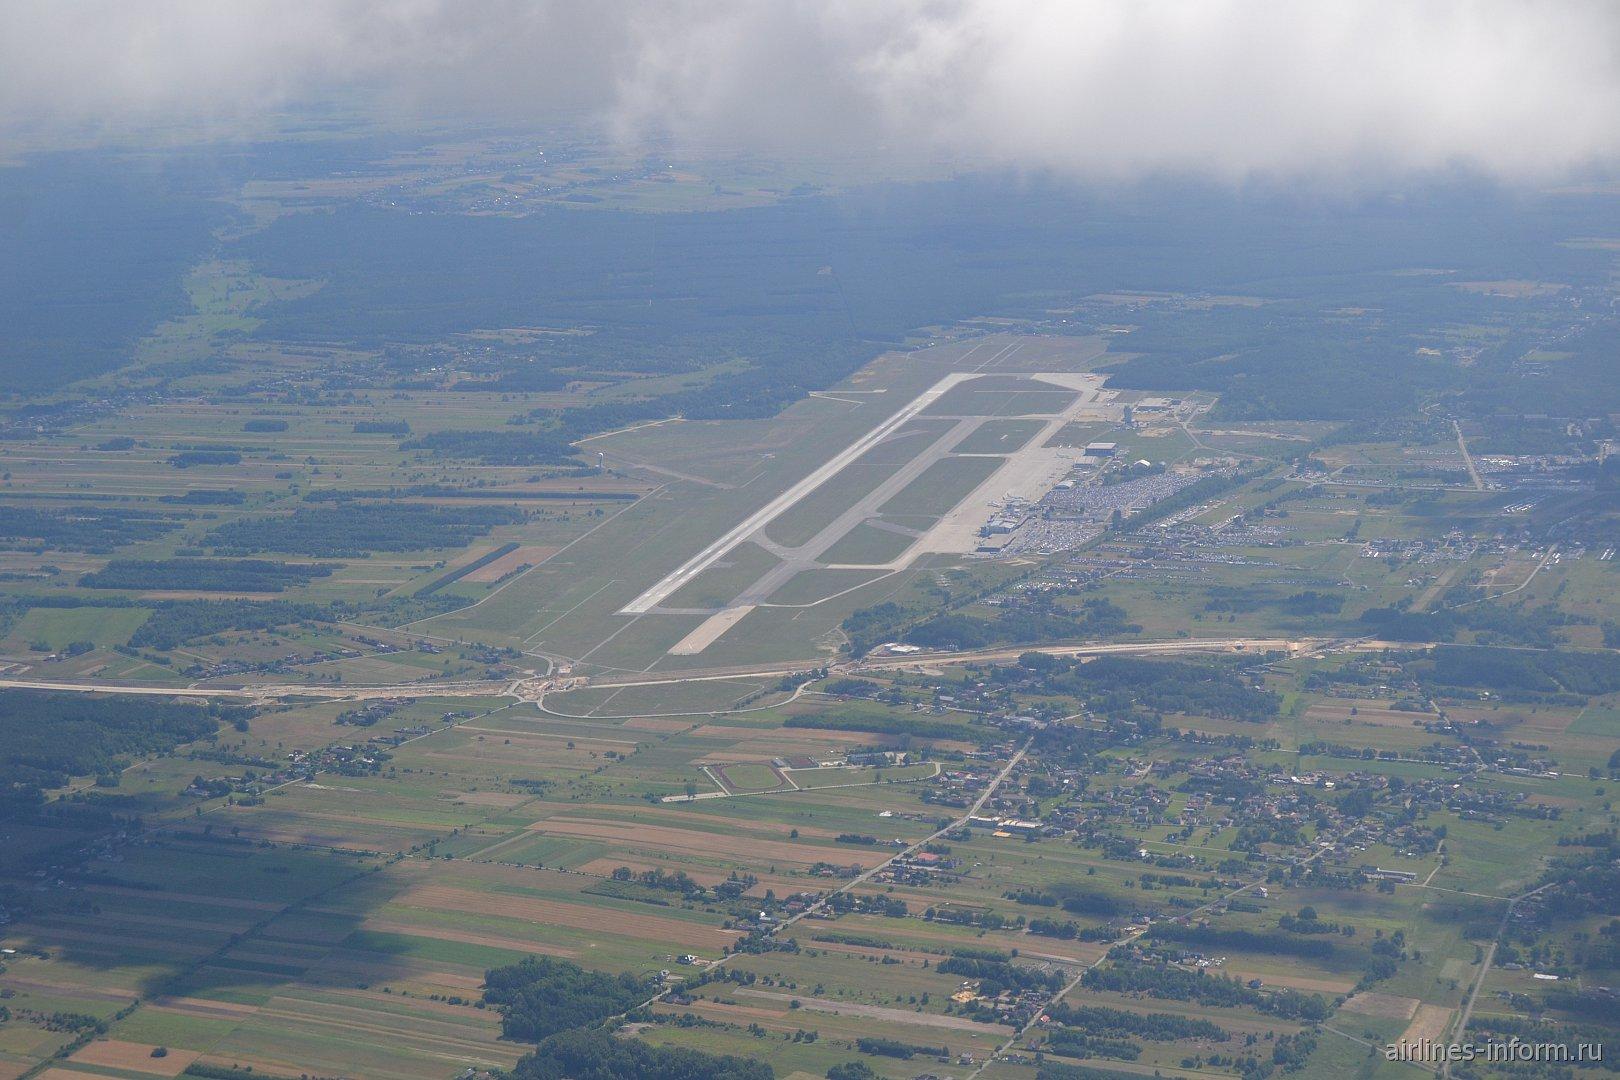 Вид сверху на аэропорт Катовице